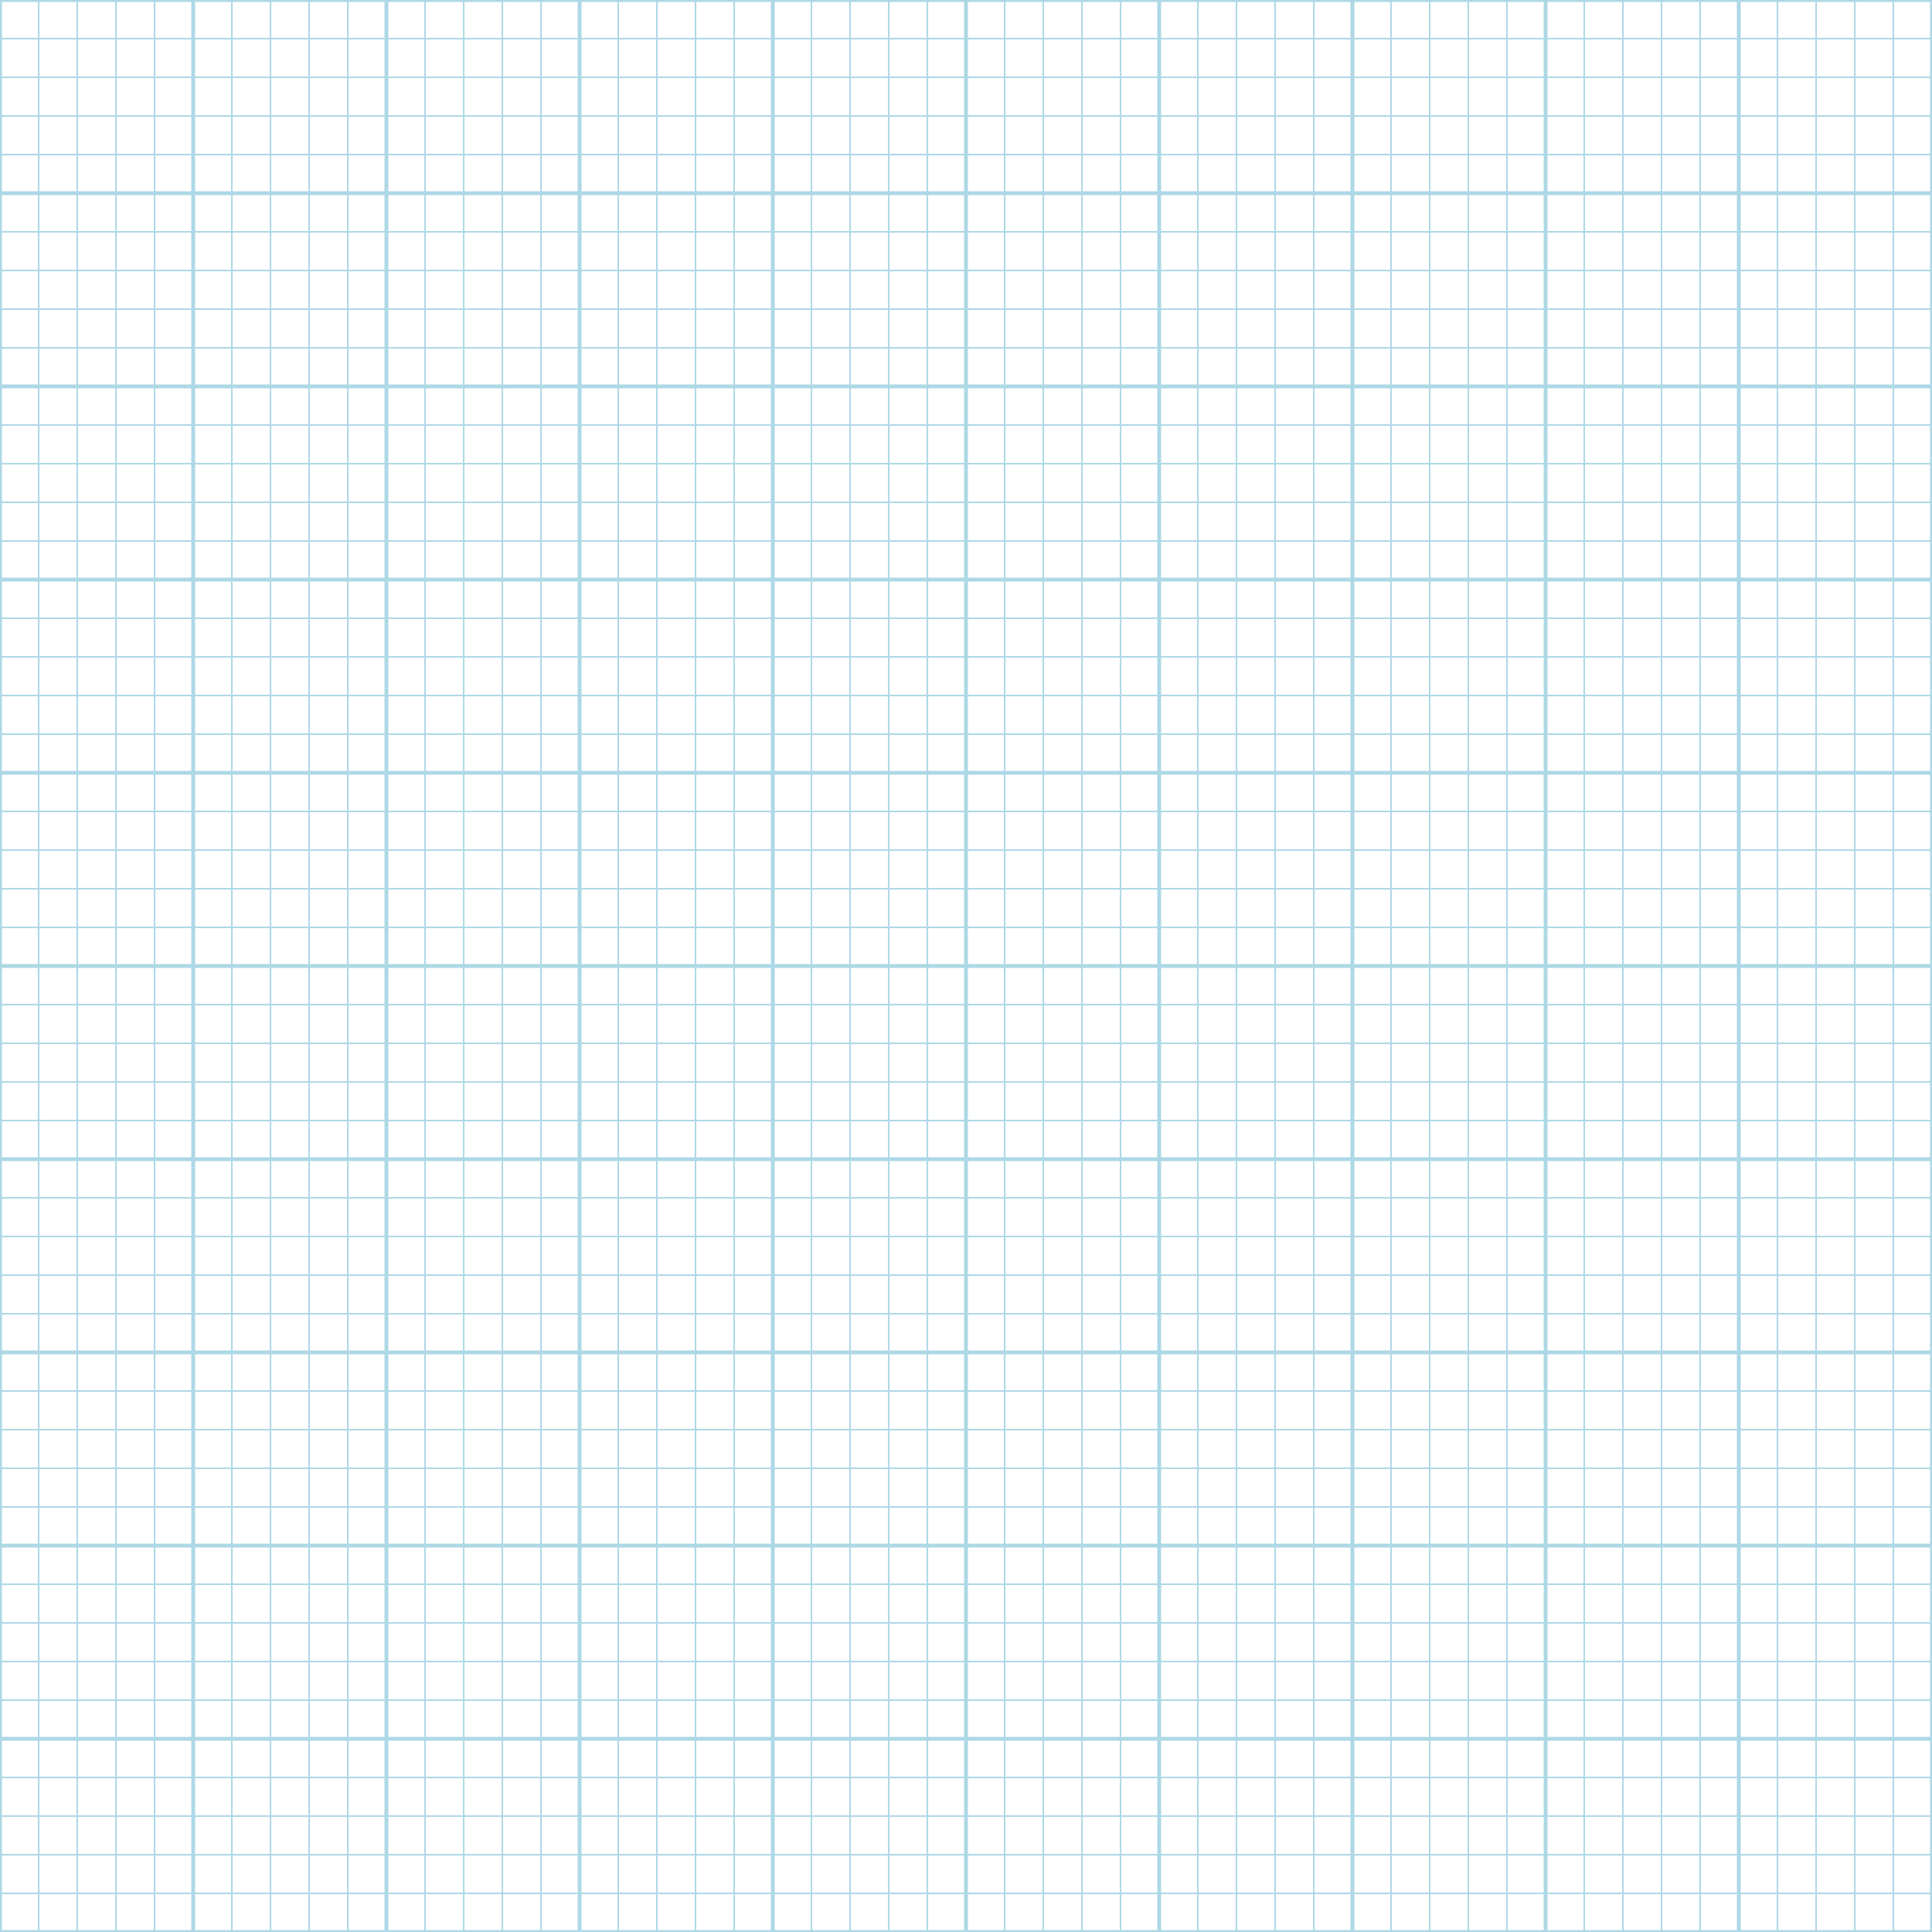 Grid Paper Clipart - Clipart Kid